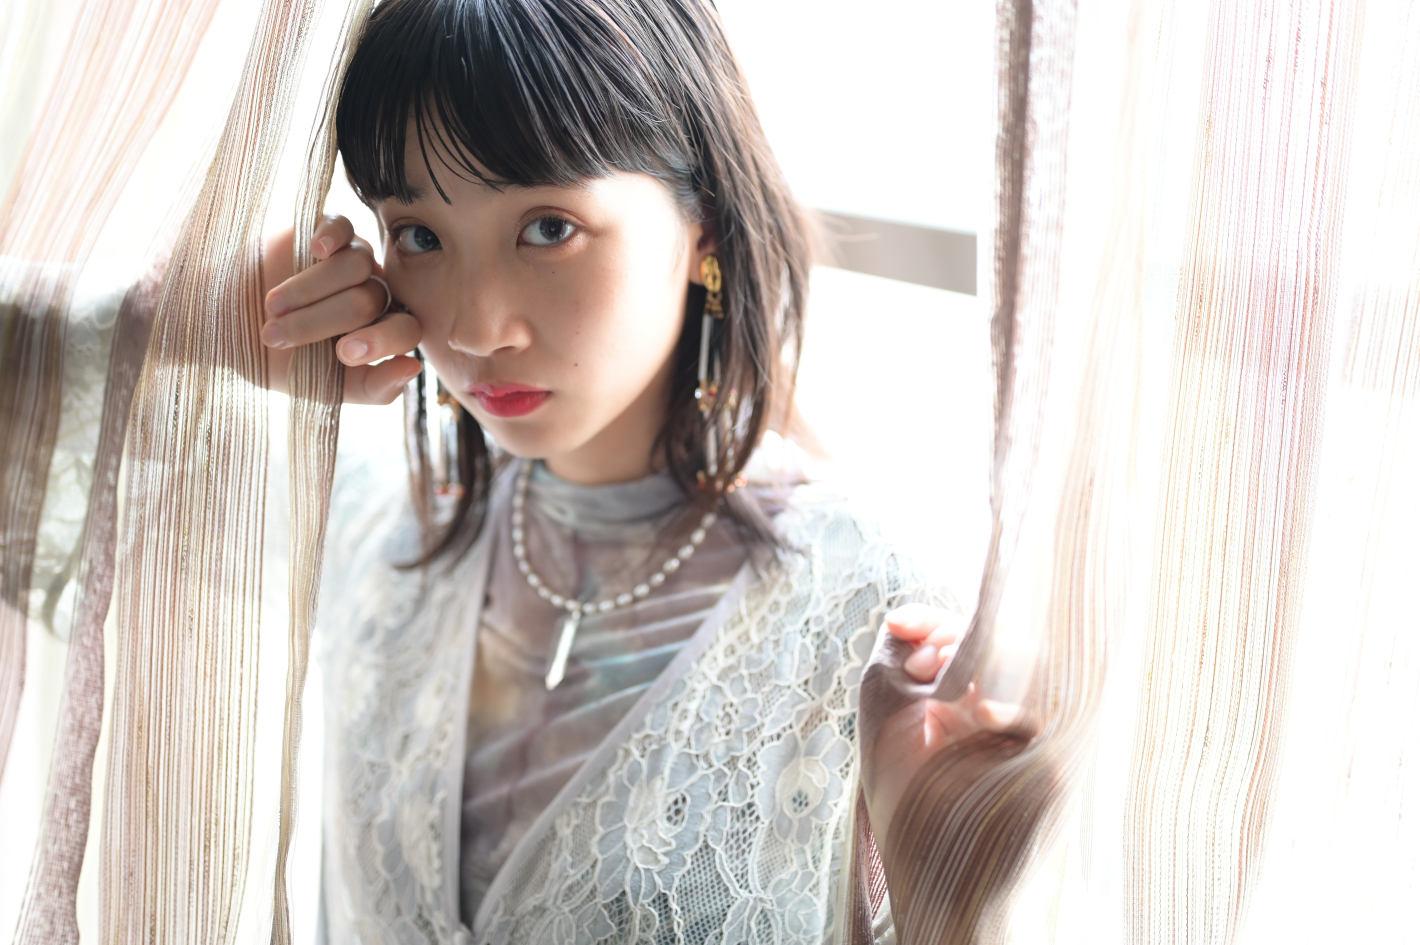 Z 6II、NIKKOR Z 50mm f/1.8 S/photo by 美花